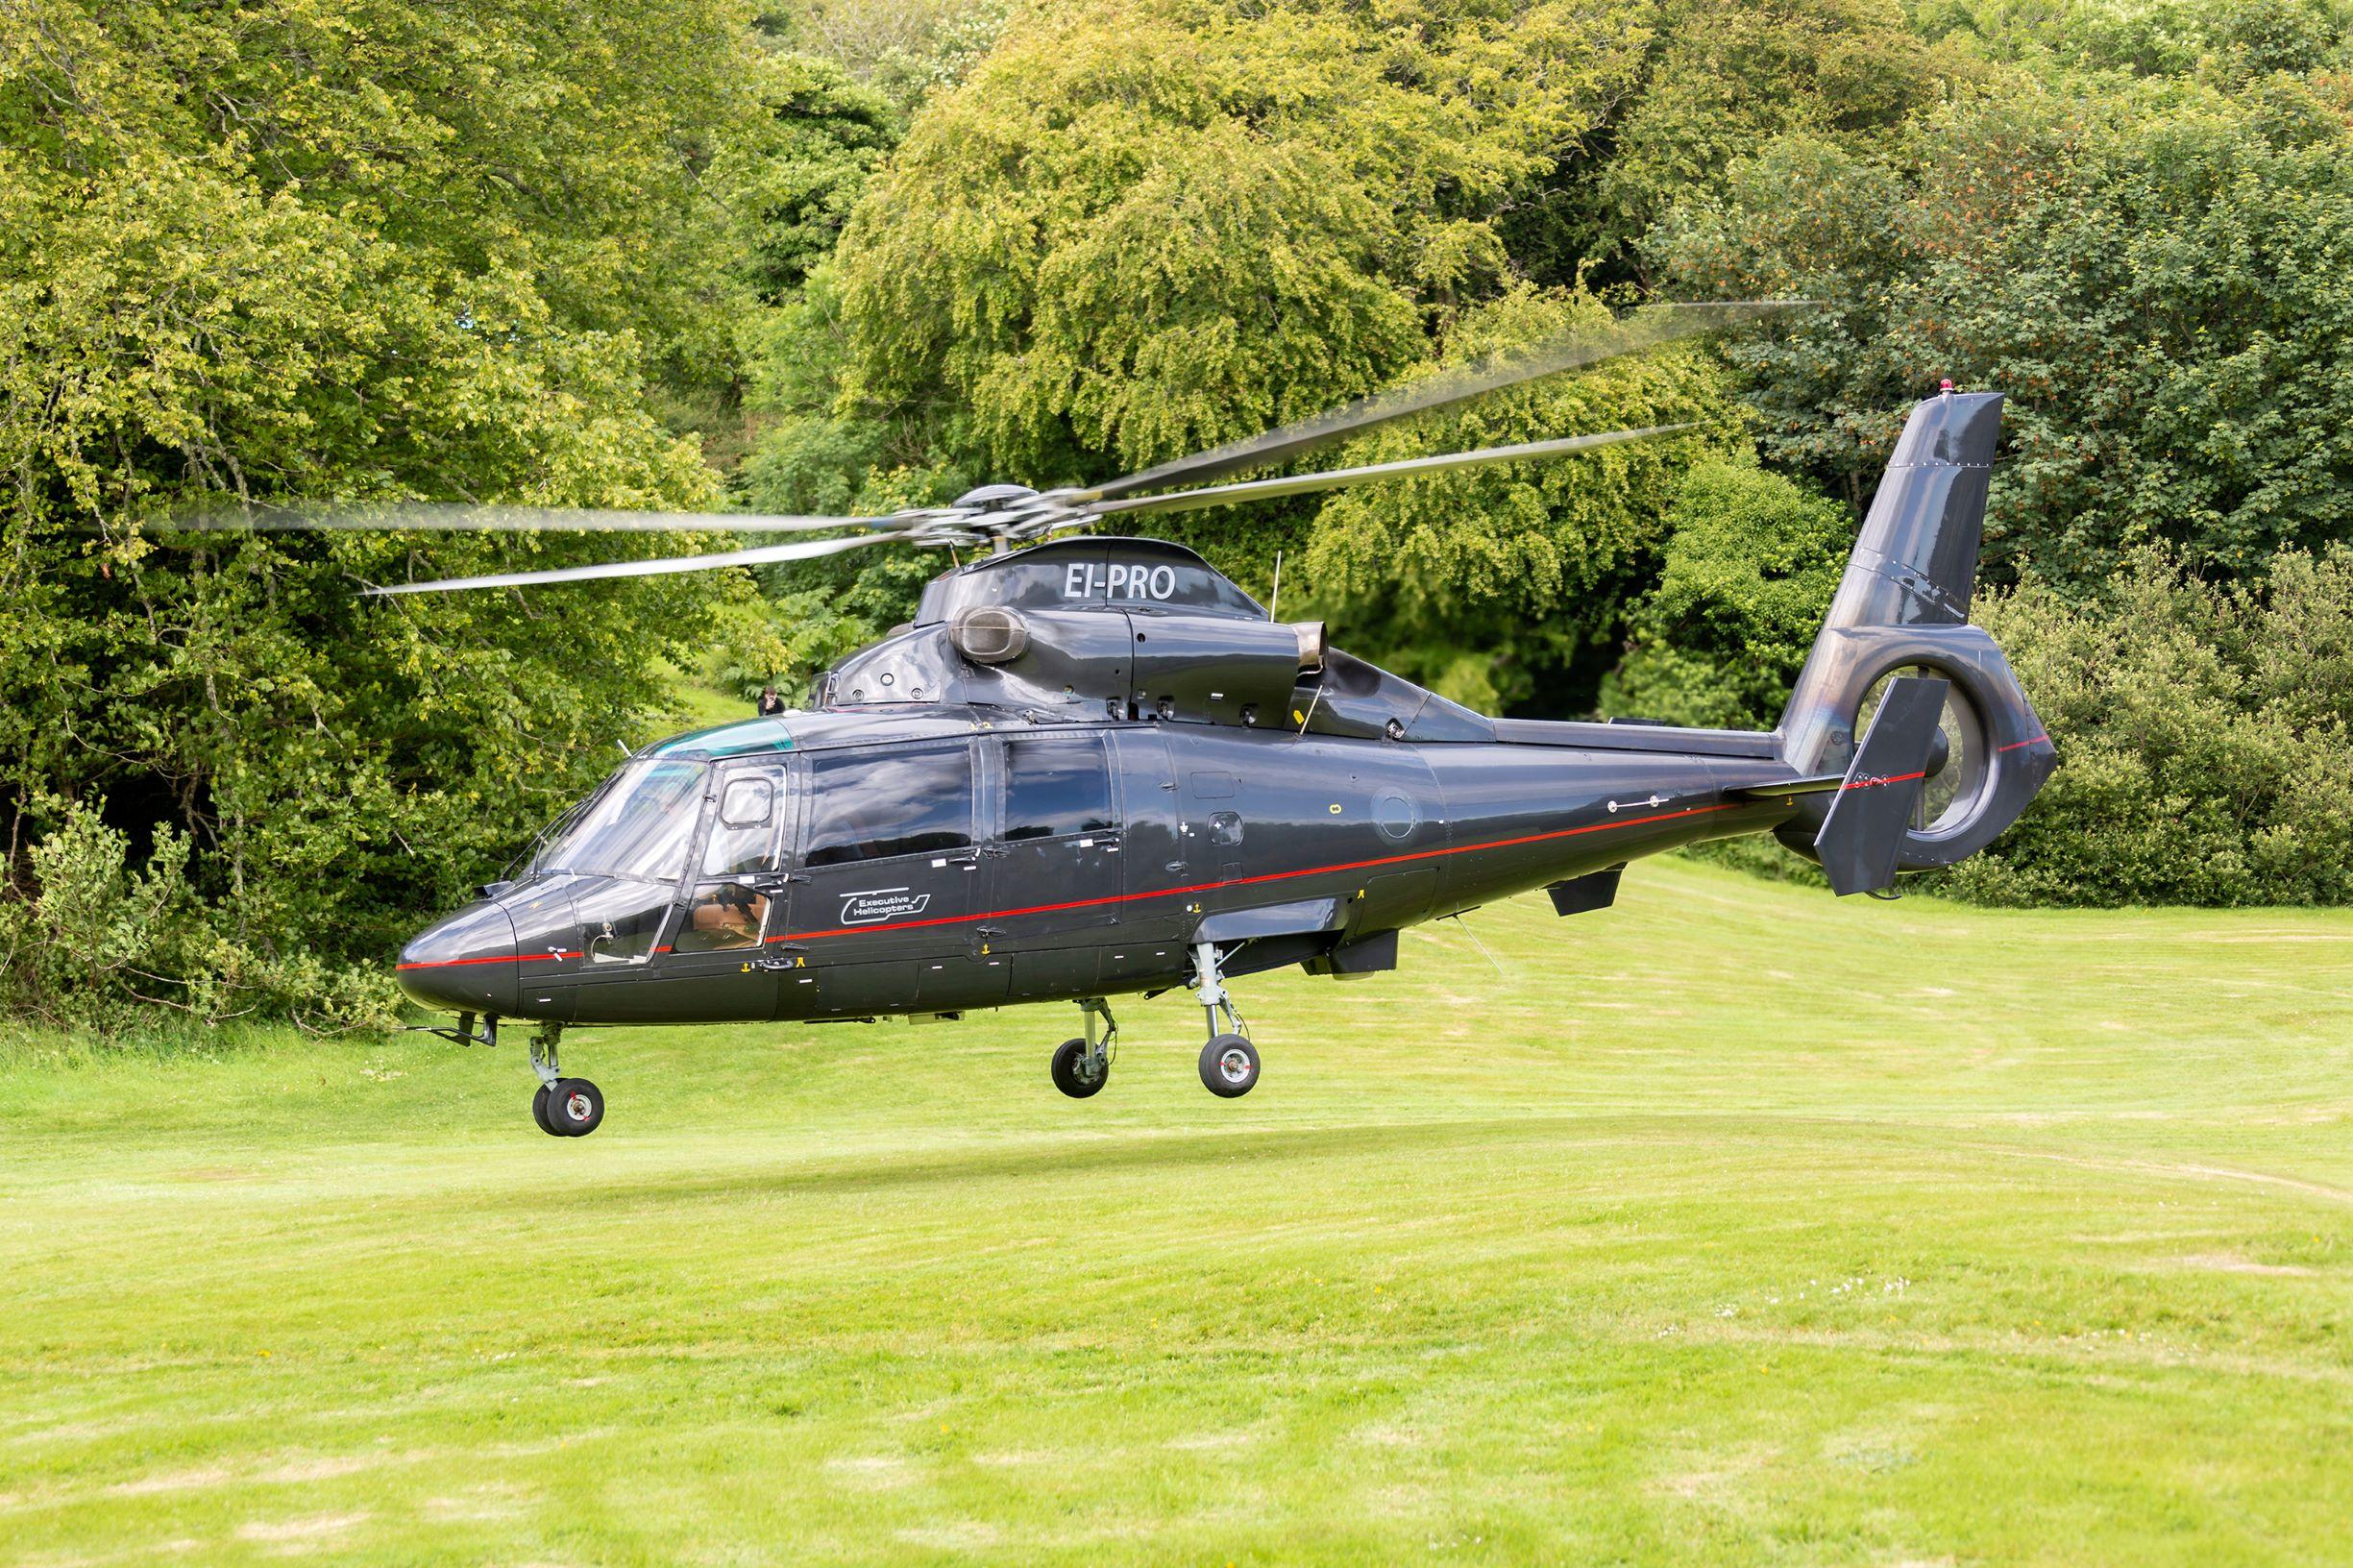 Abbeyglen Hotel Helicopter AS365 Dauphin take off